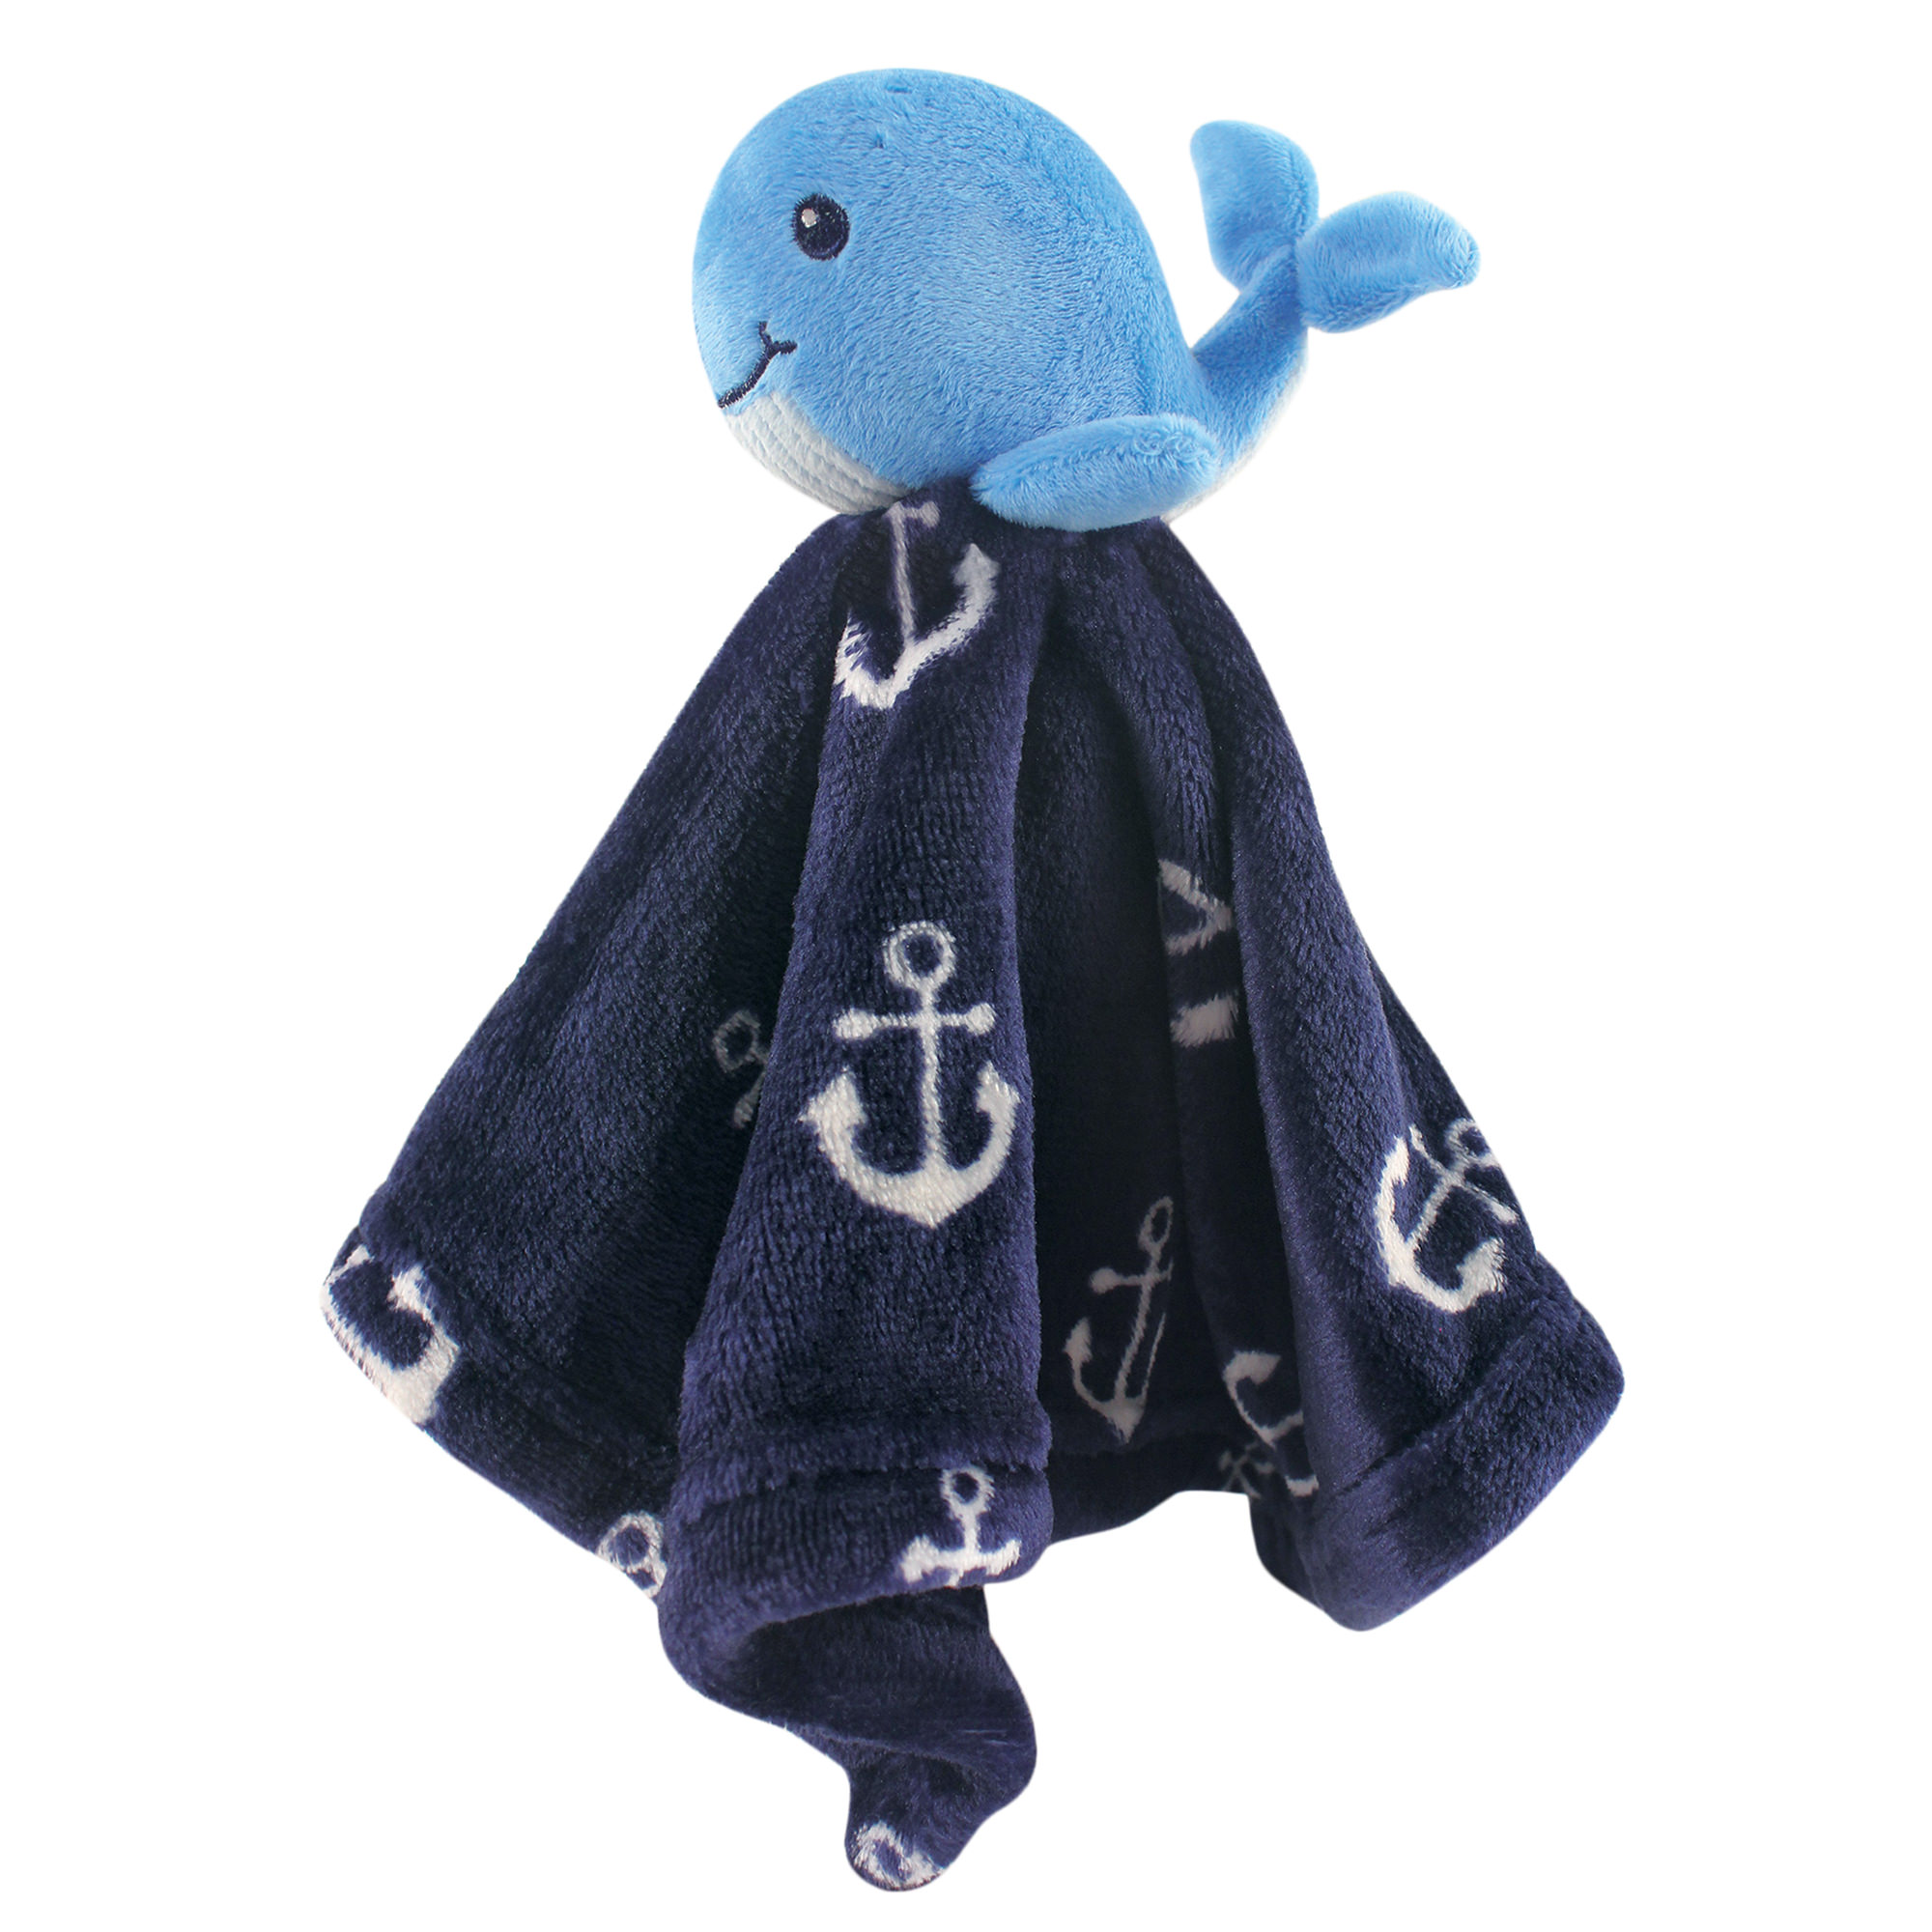 Car Seat Blanket Stroller Blanket Minky Baby Blanket Baby Blanket Security Blanket Whale Baby Blanket Baby Blanket Whales